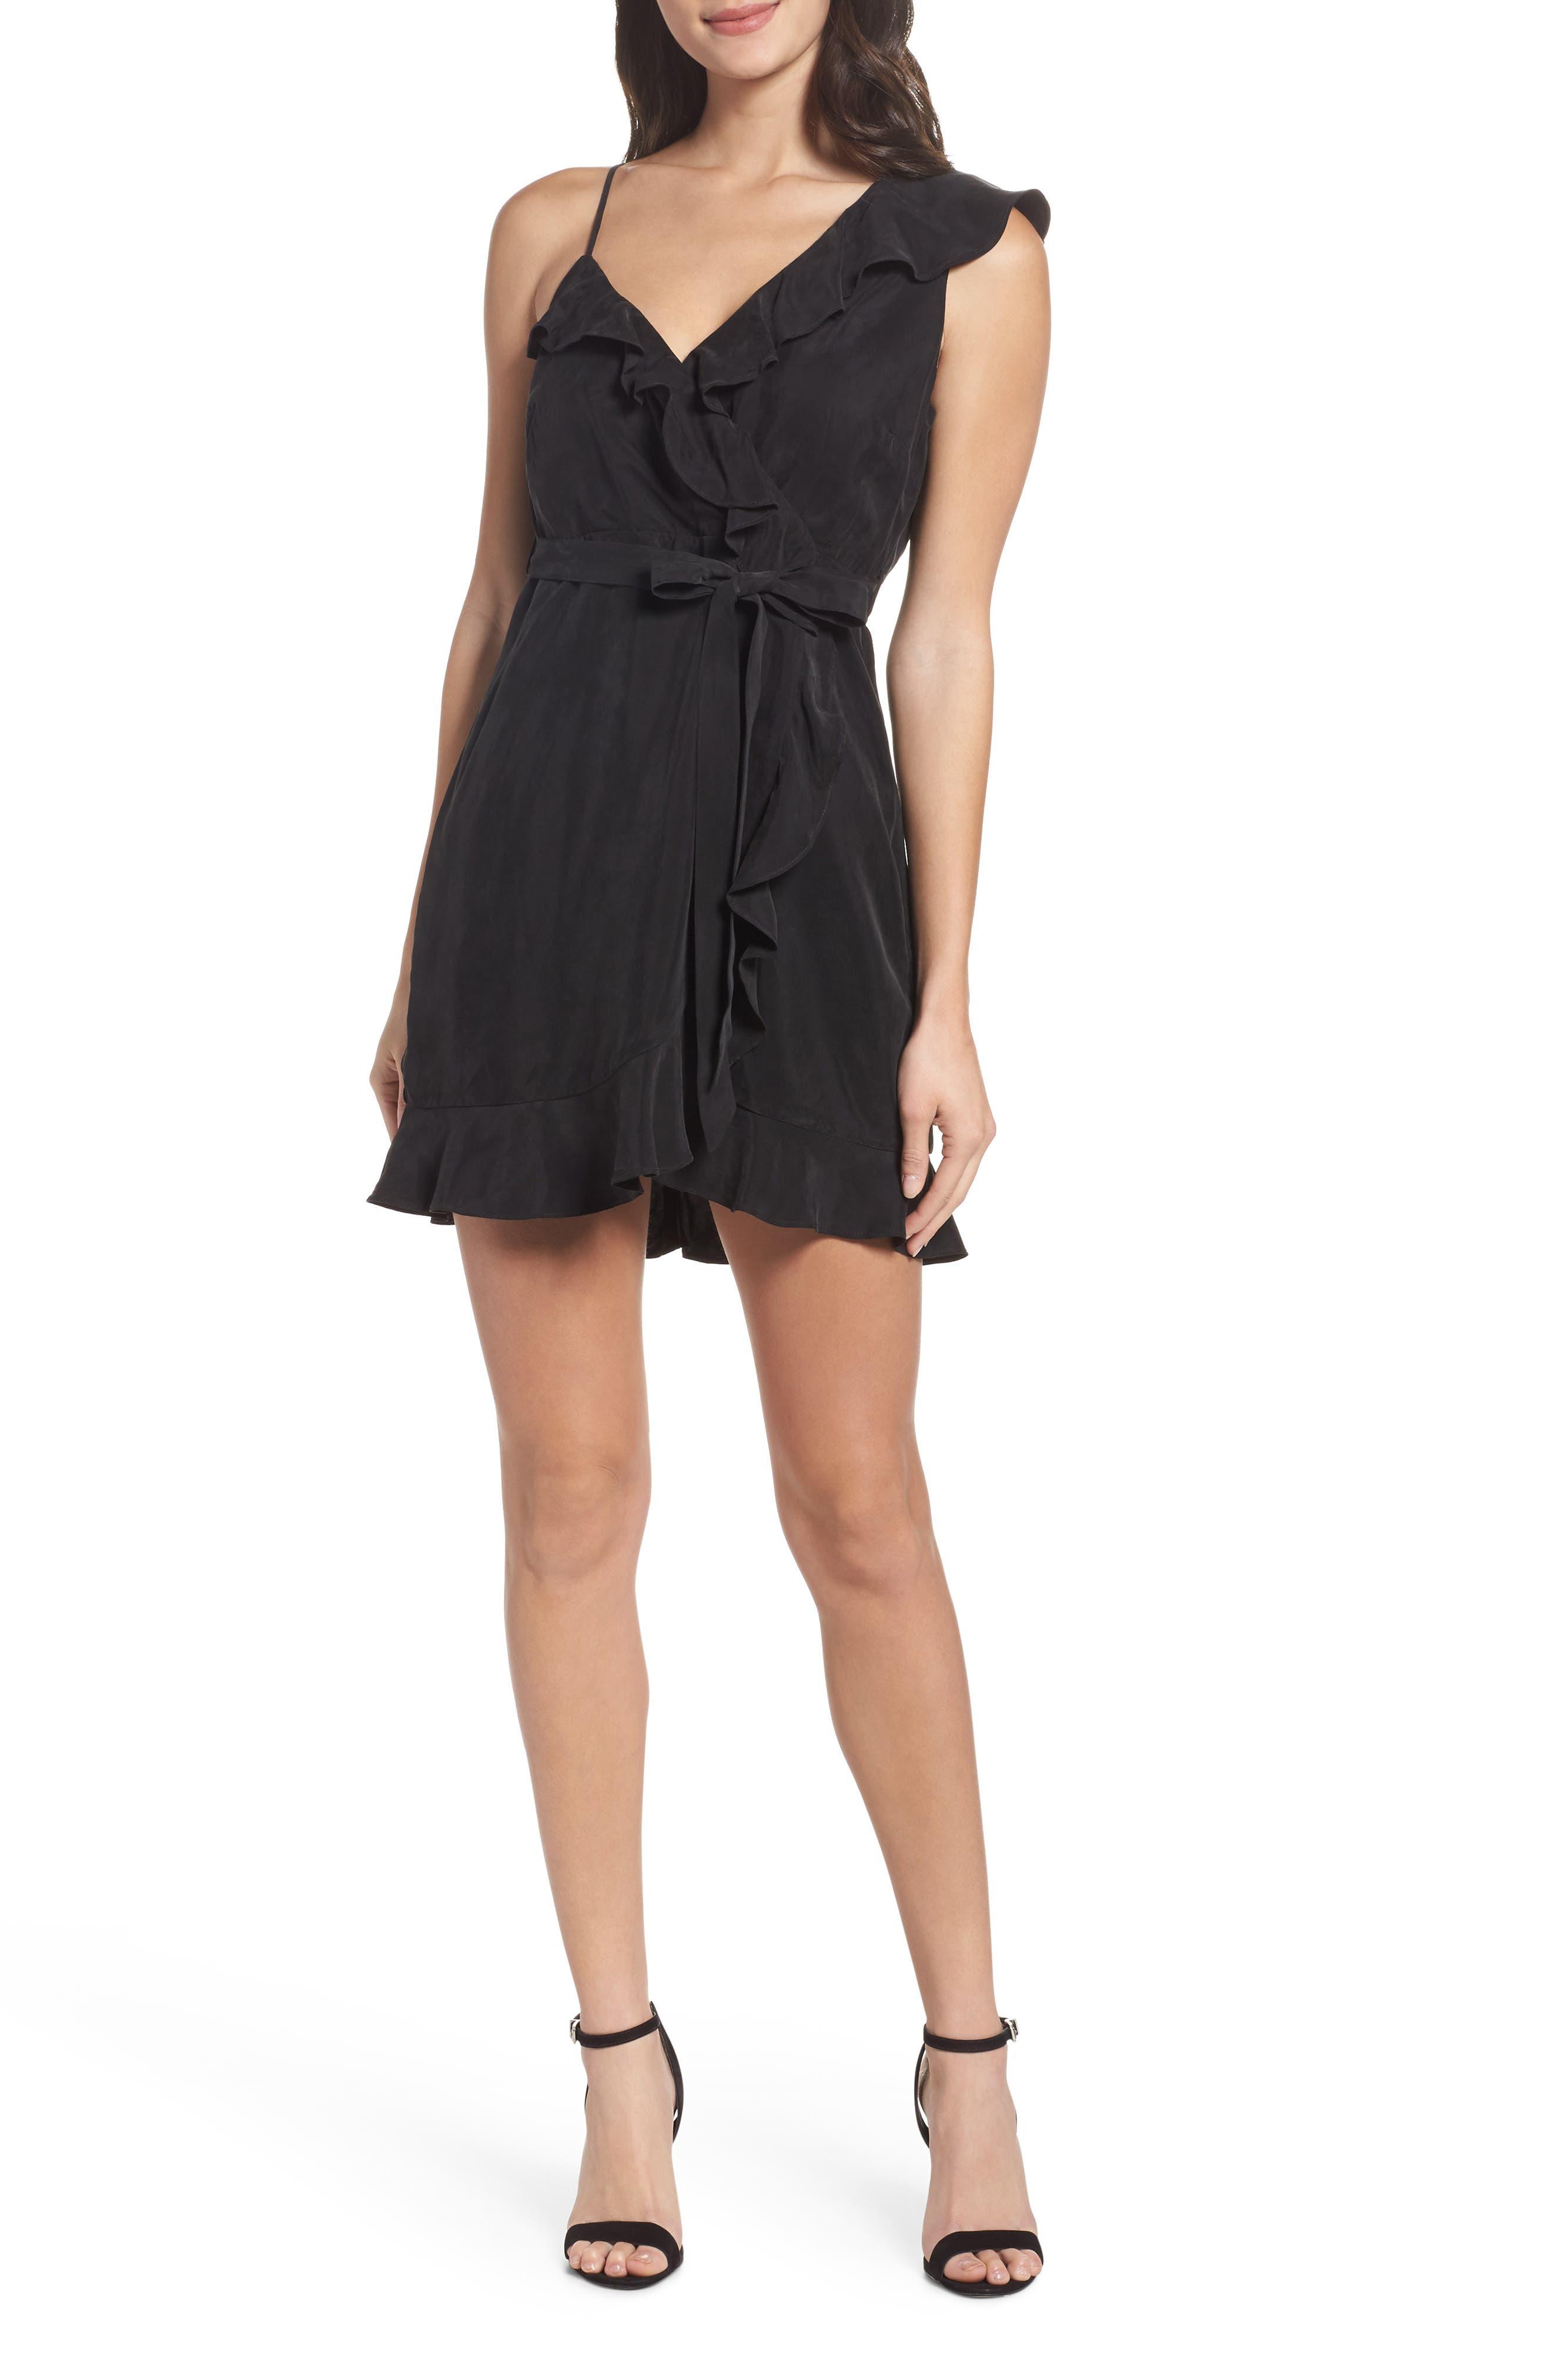 Milly One-Shoulder Wrap Dress,                             Main thumbnail 1, color,                             Black